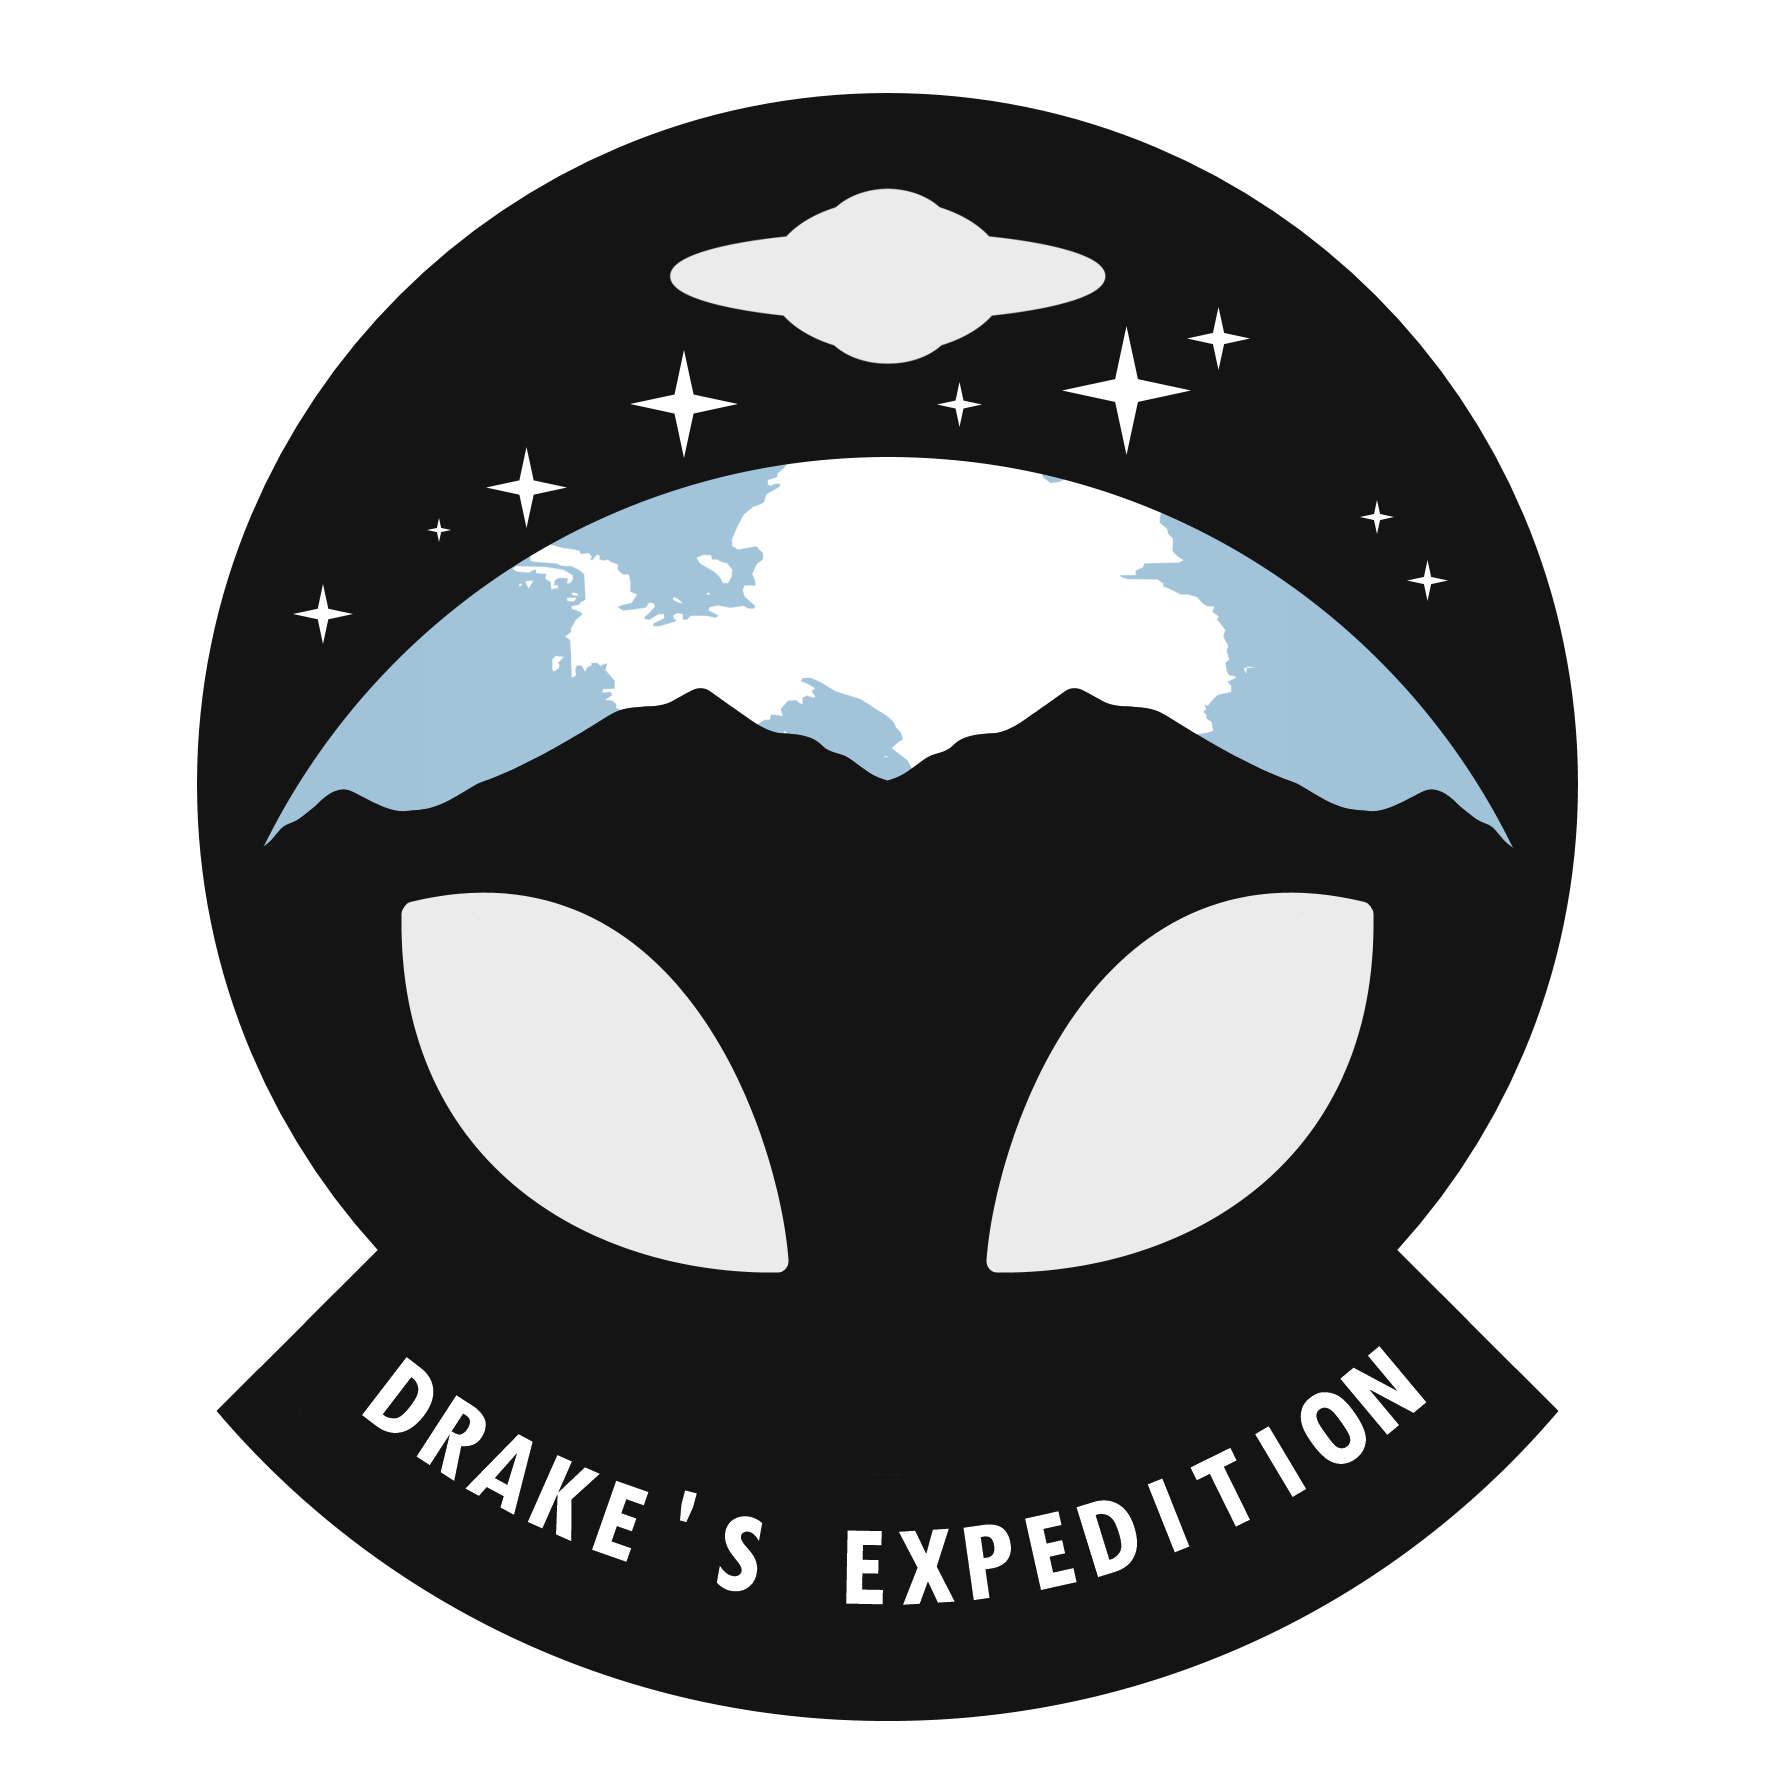 ANTARTICOM_Drakes_Expedition.png